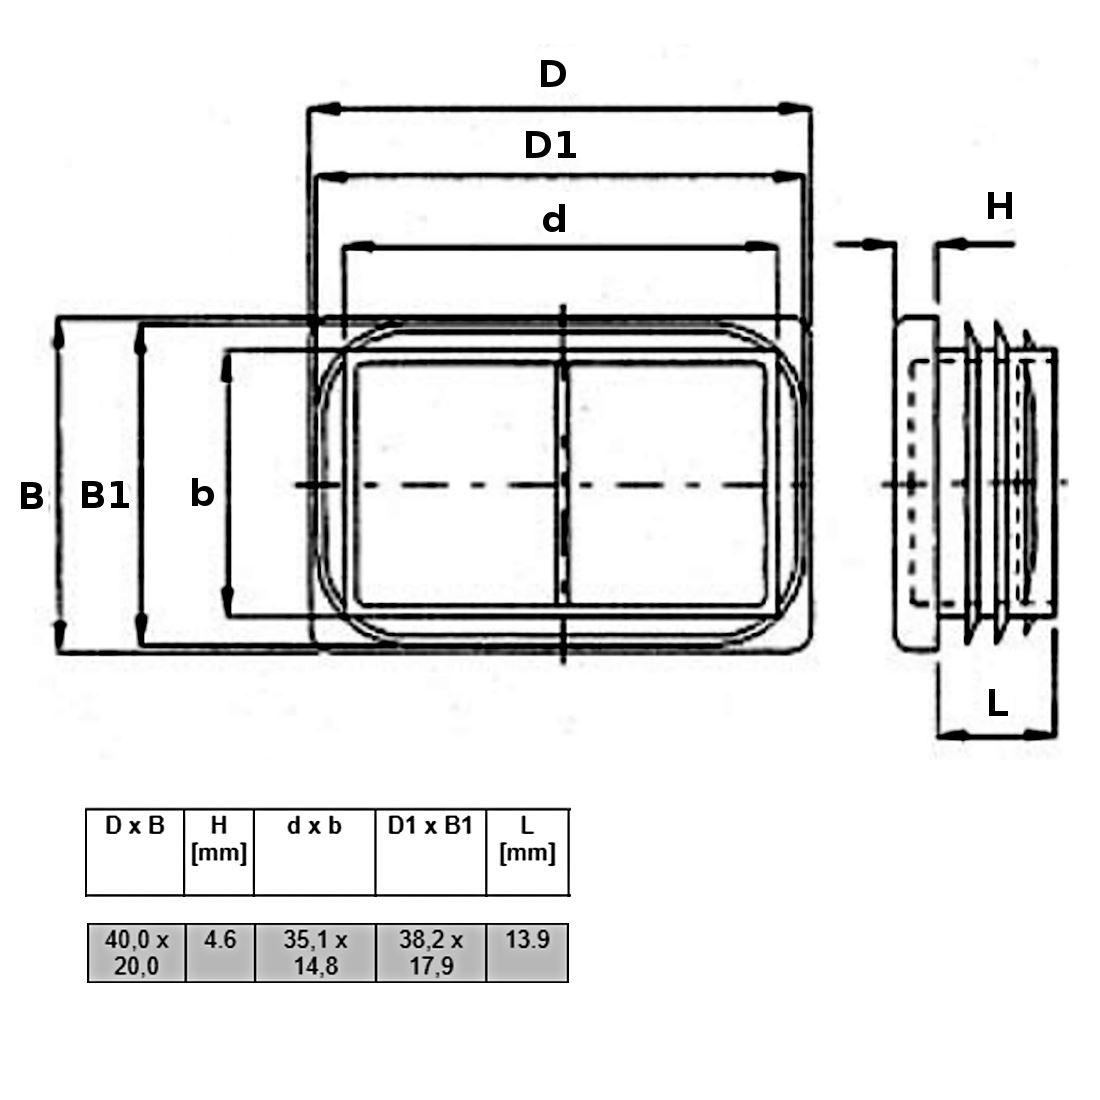 60x60mm Black Plastic End Cap for Profile Rod Insert Plug Pack of 4